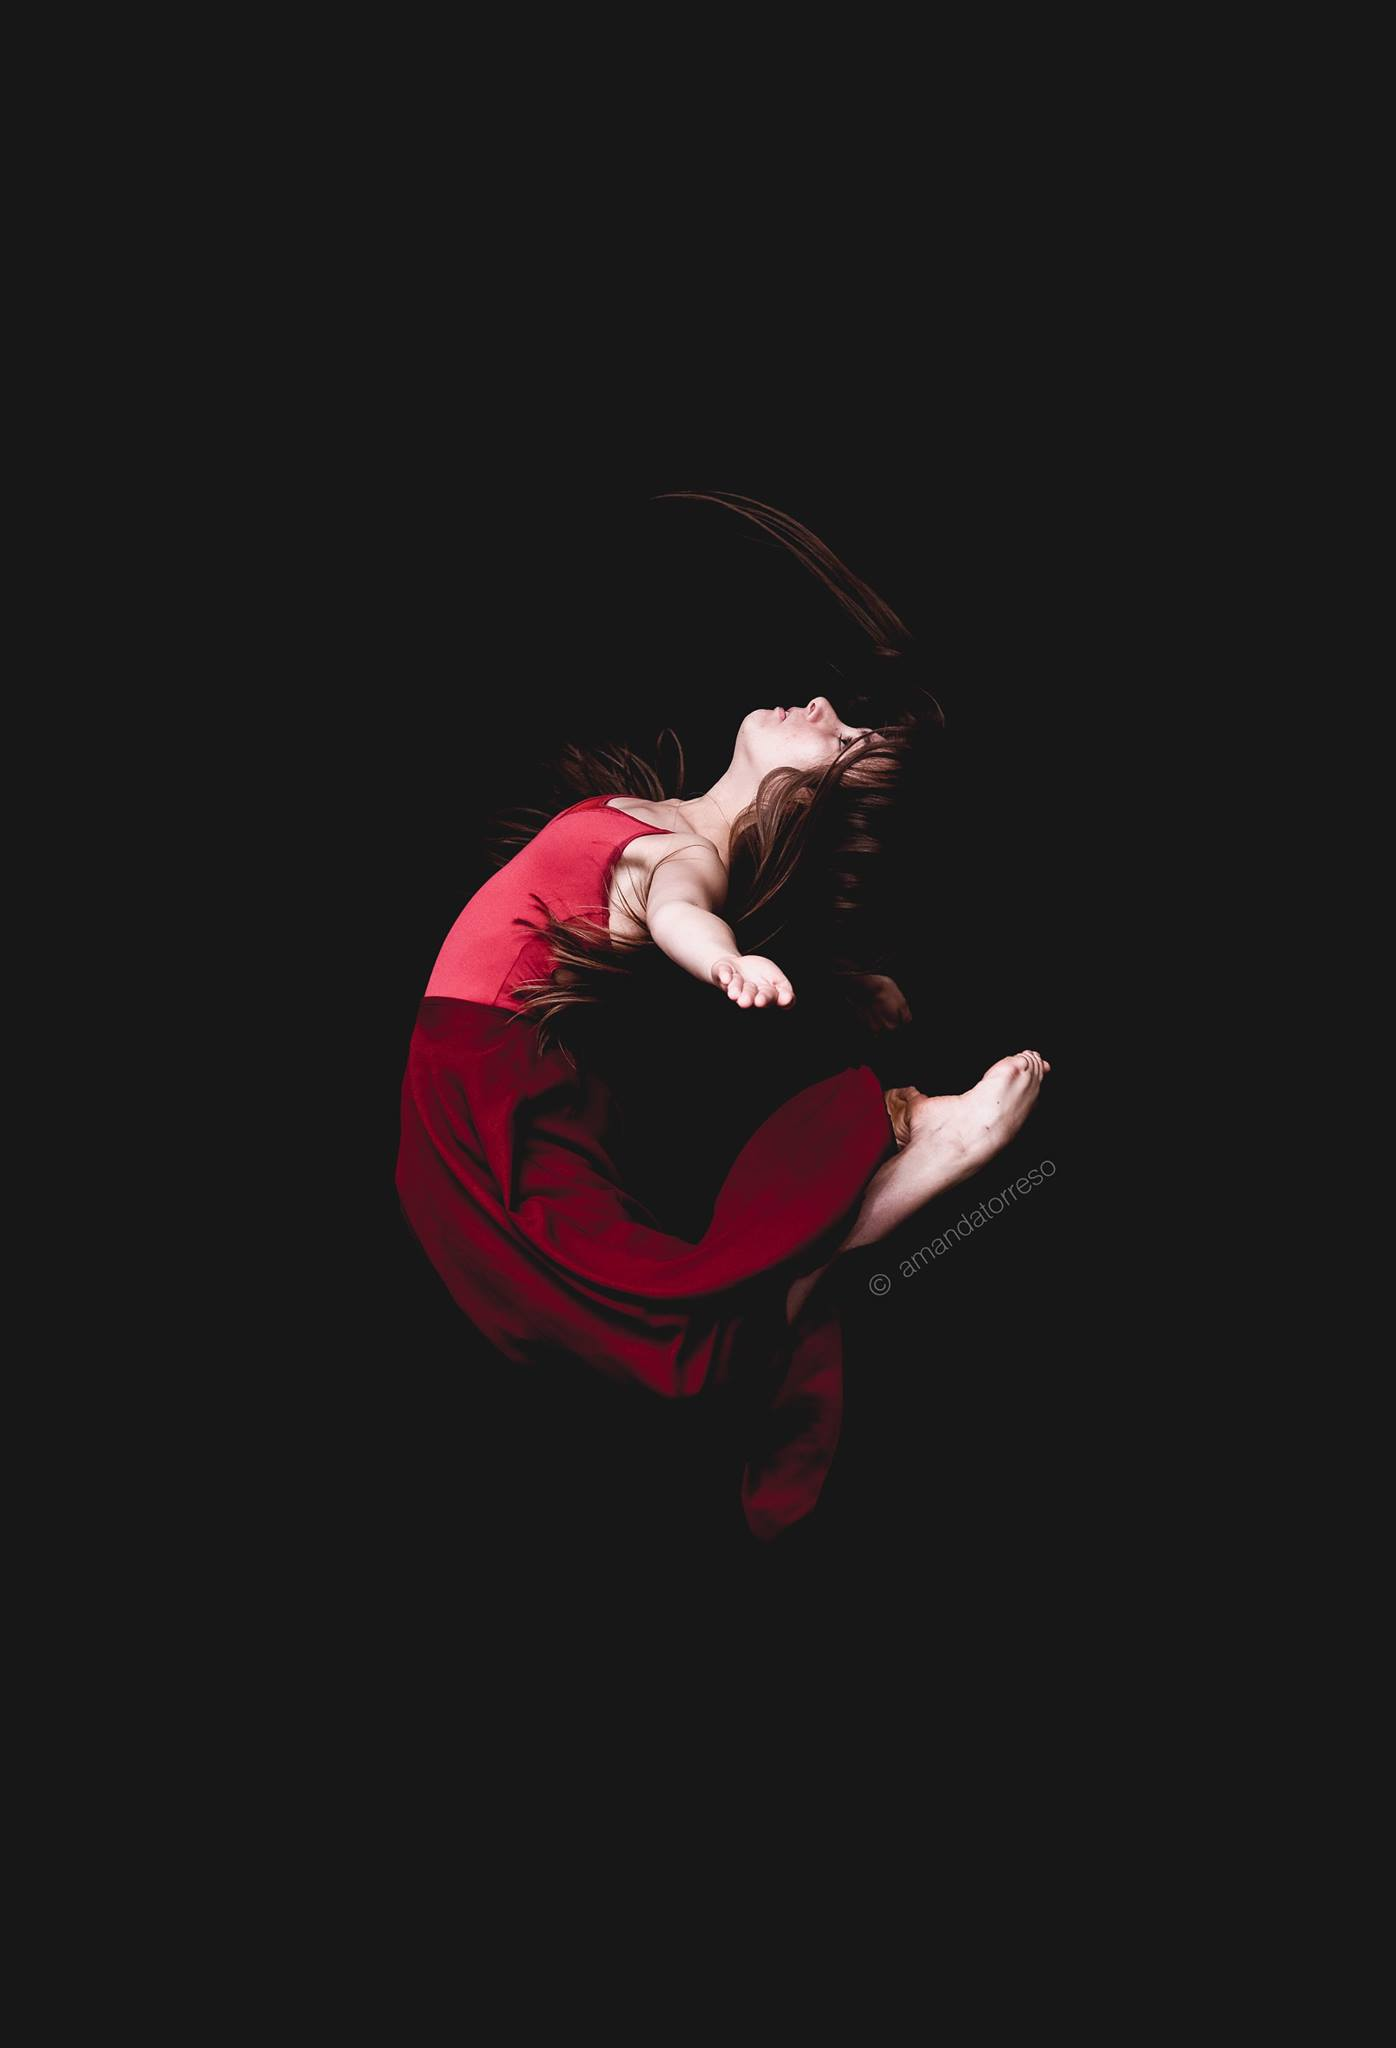 Clara Ossandon (15) Fotografía Amanda Paz Torres 2016